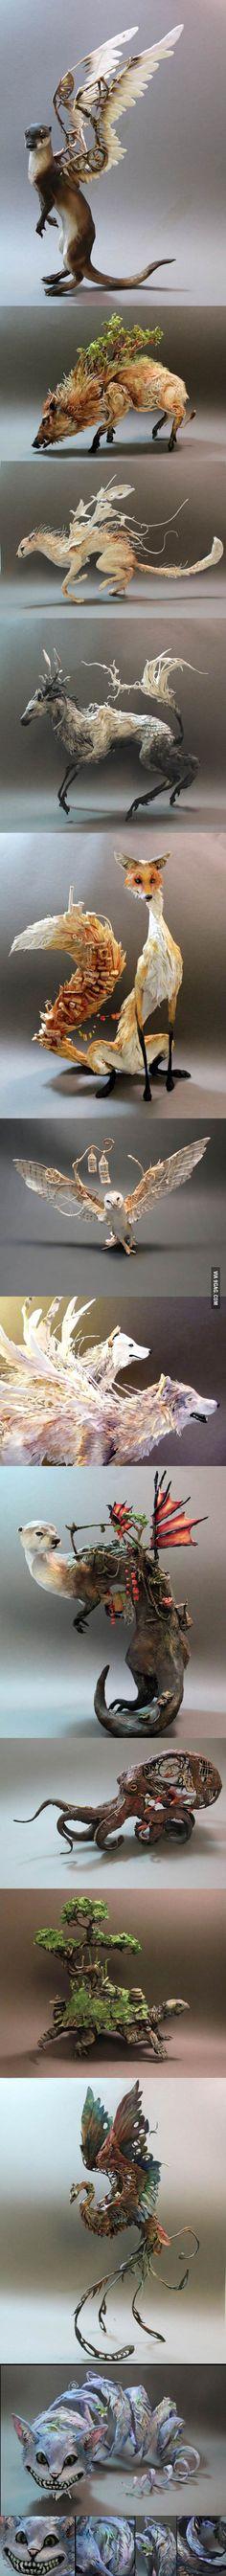 Phantasmagorical Animals by Ellen Jewett